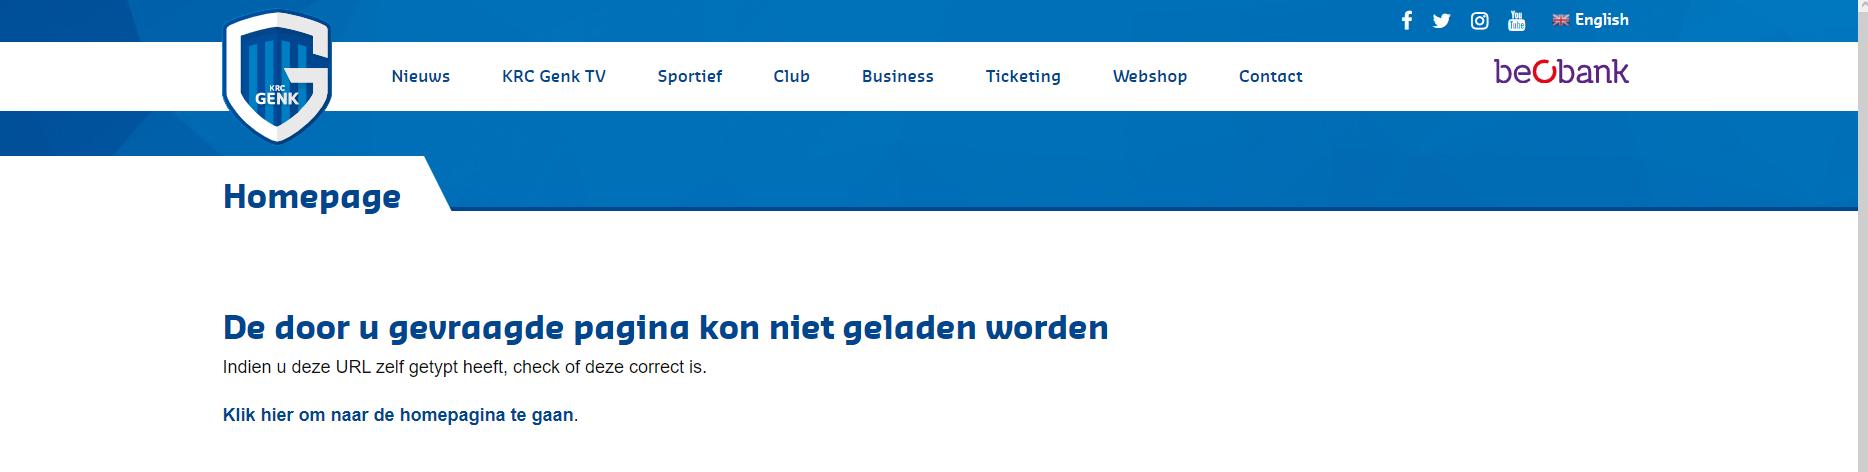 https://i.eurosport.com/2020/05/26/2824259.png